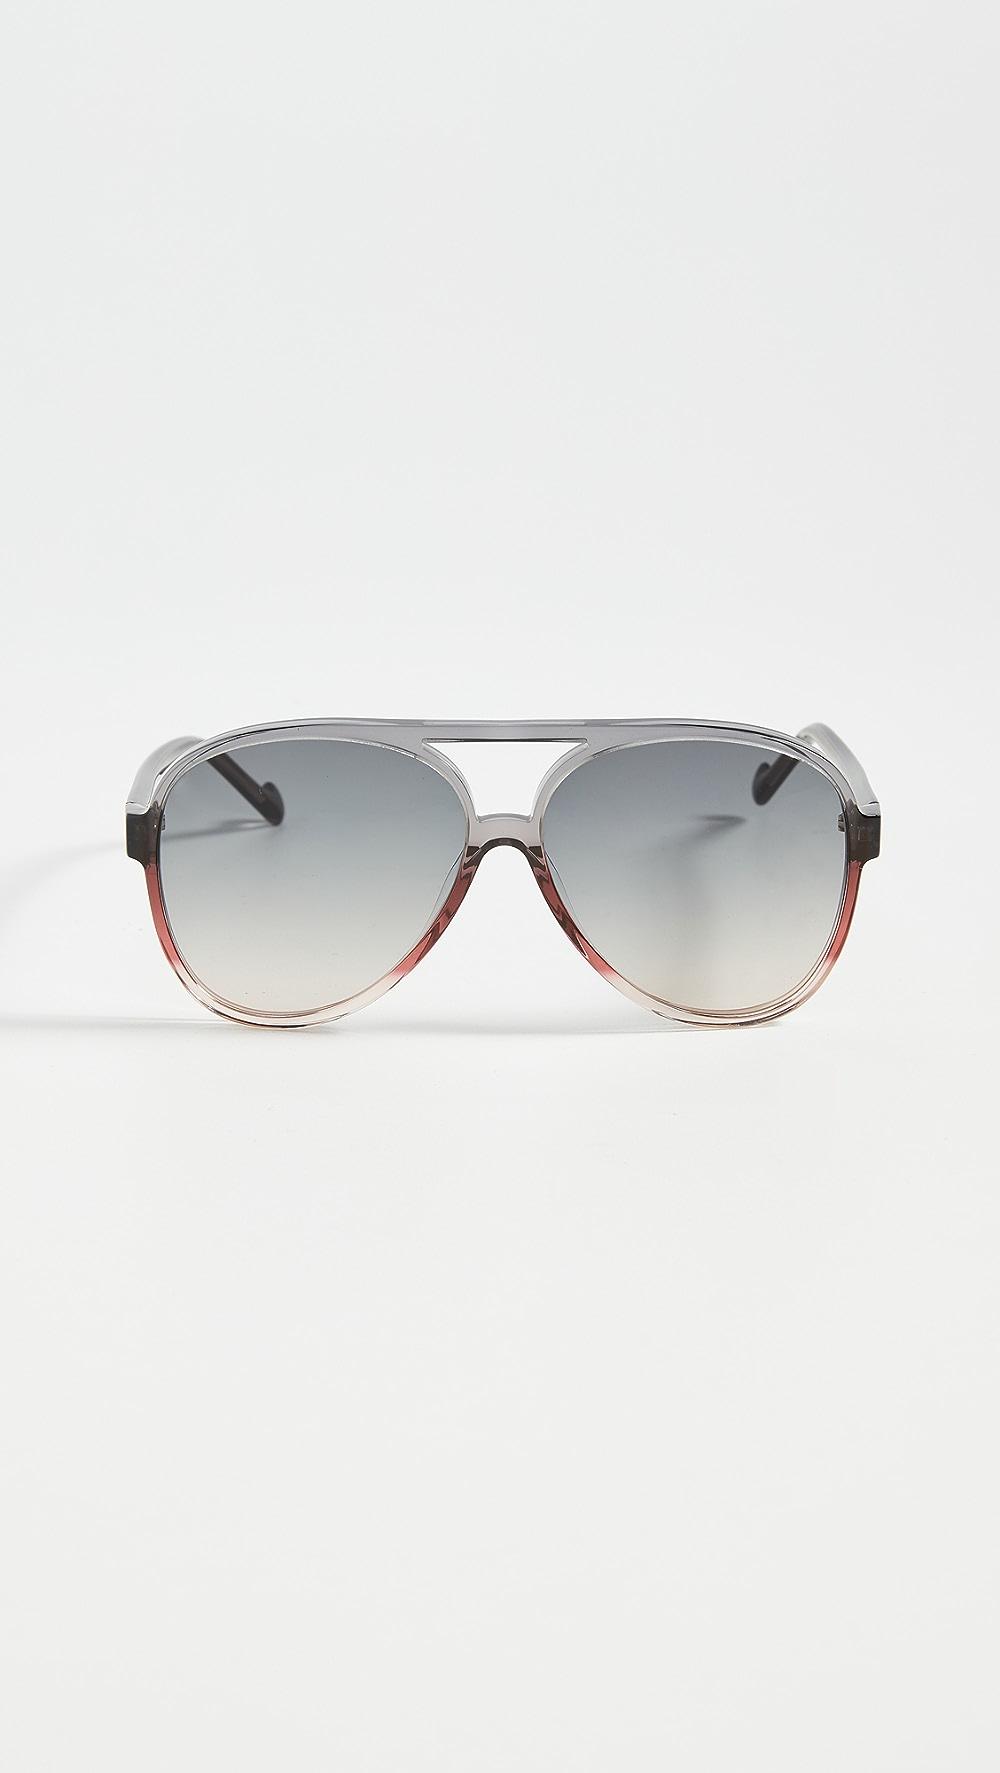 Zimmermann Eyewear